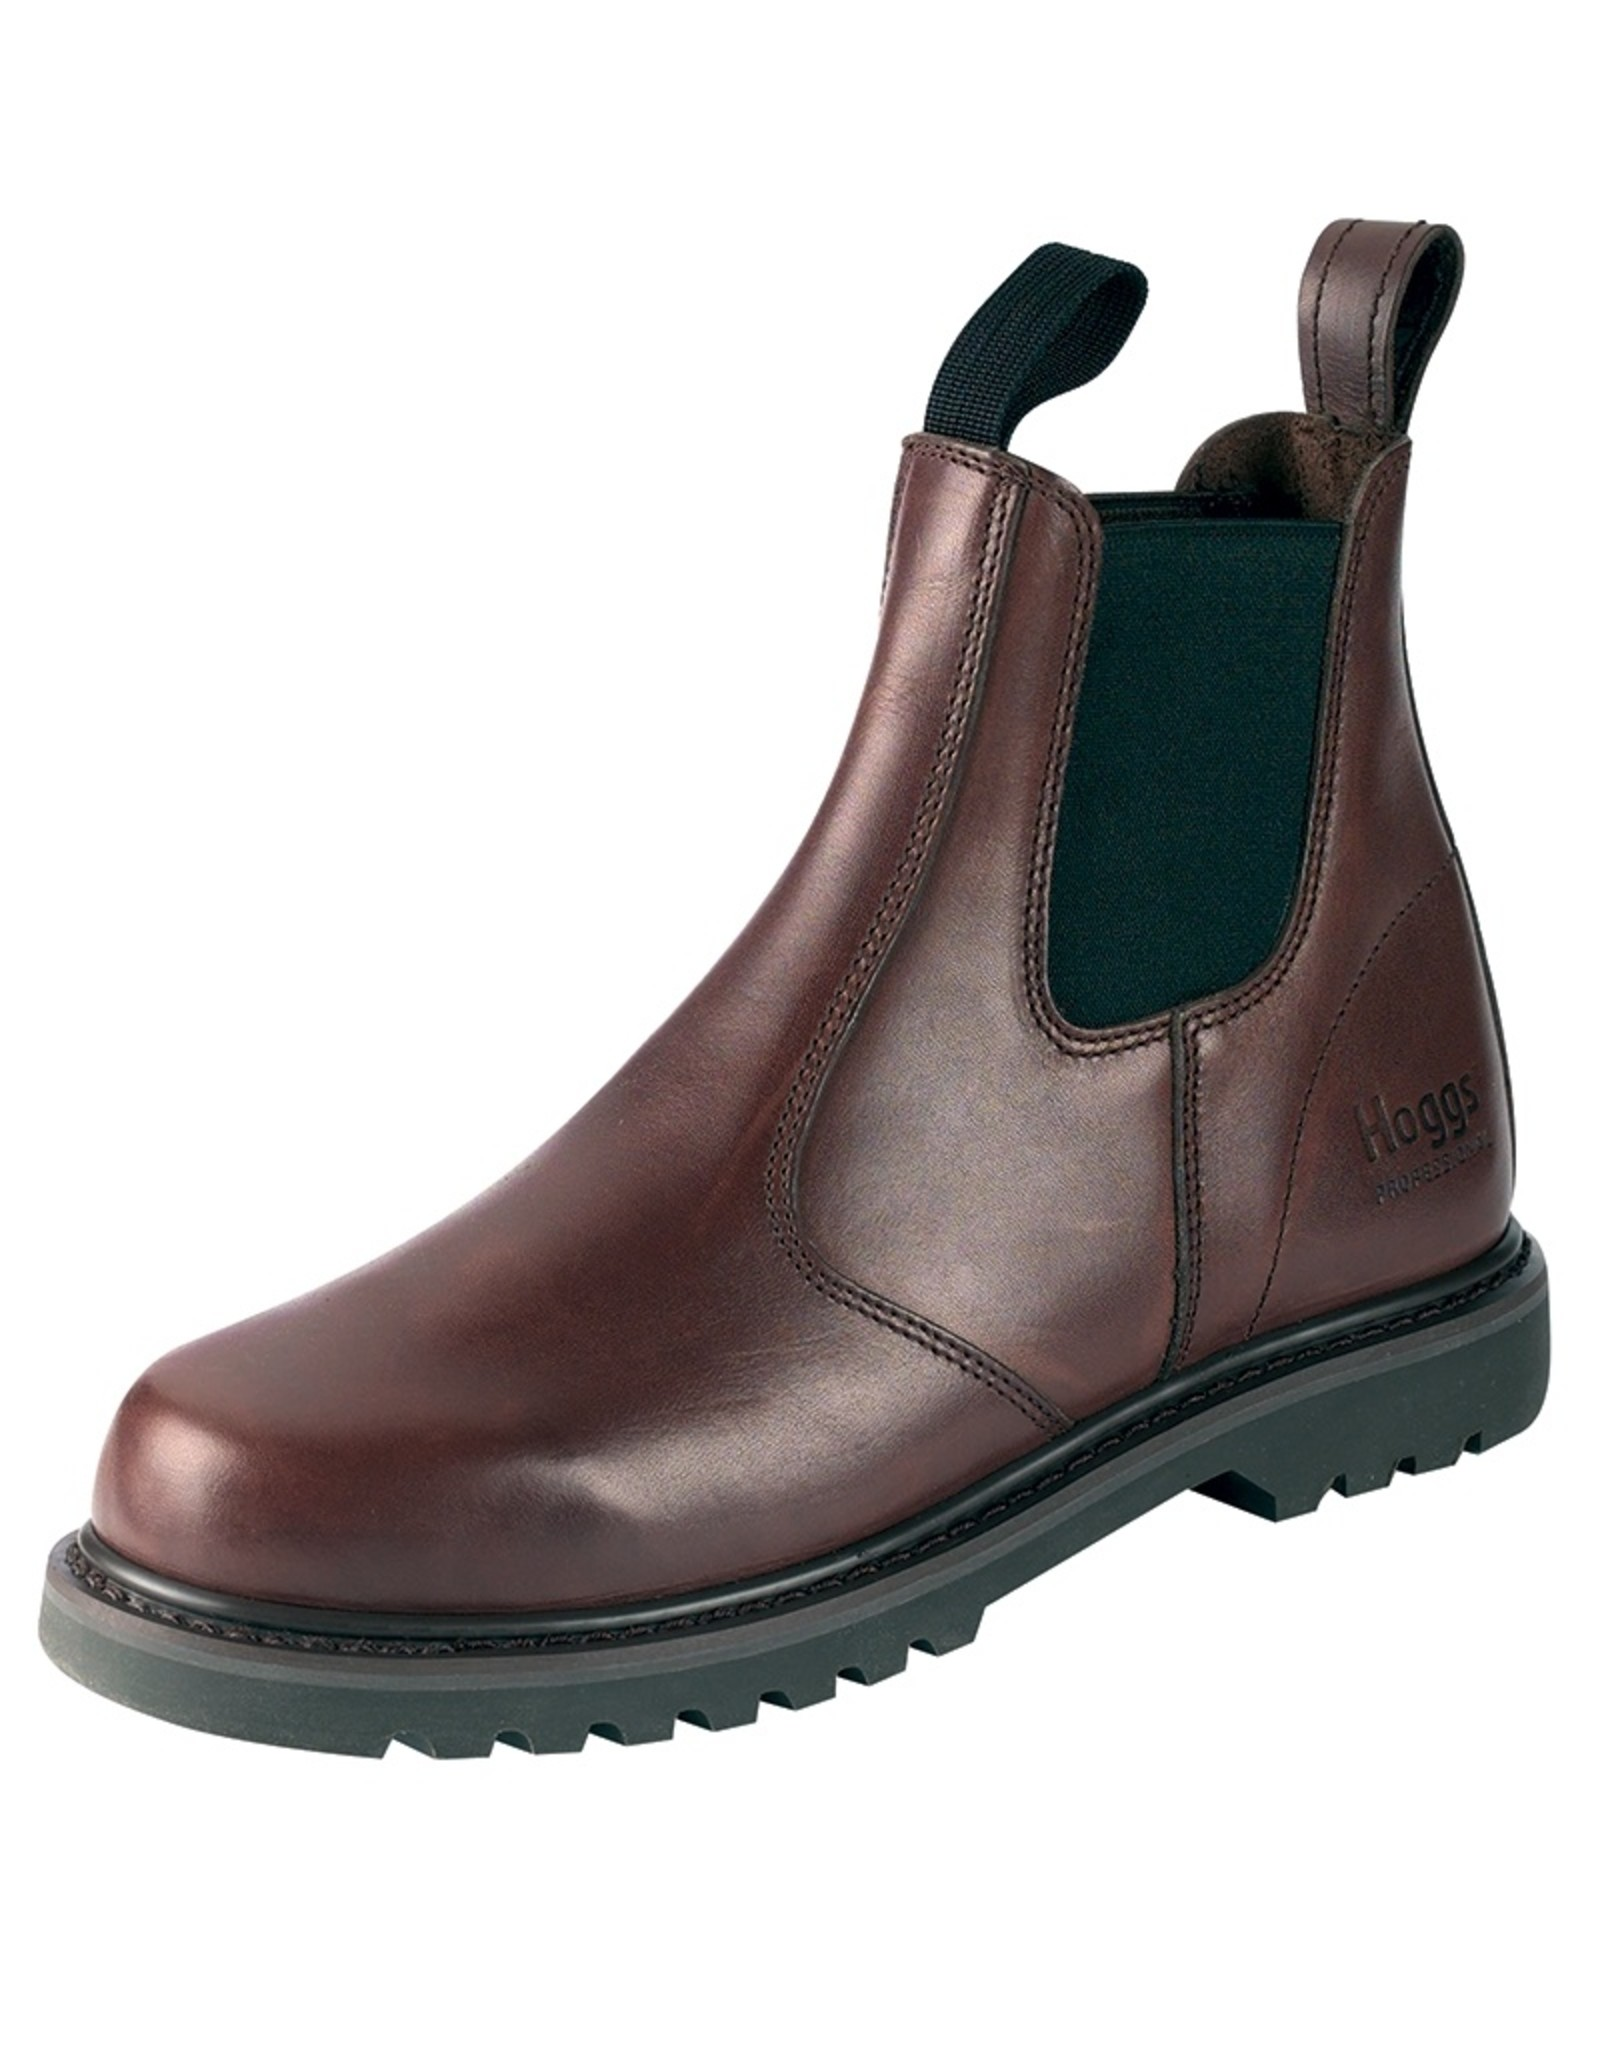 Hoggs Hoggs Shire-nsd Dealer Boot